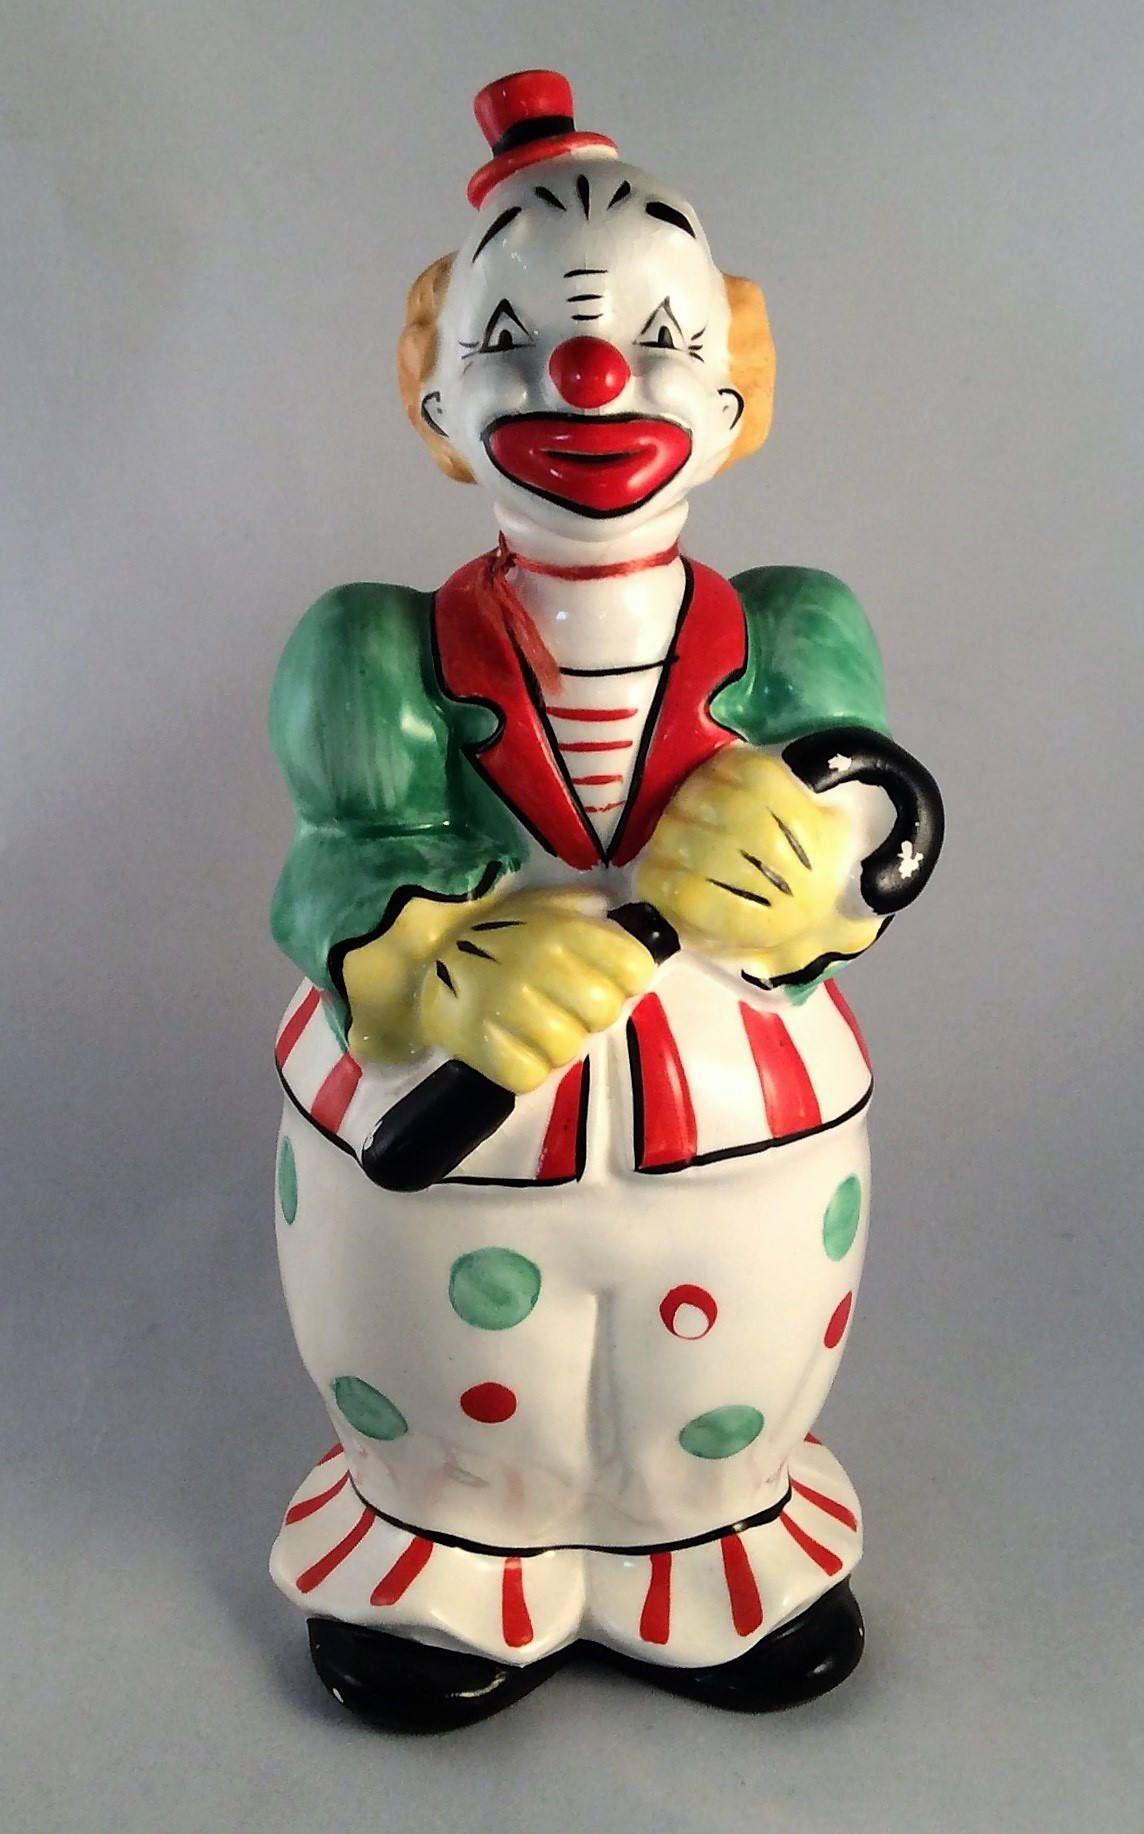 87d14b6da7da0 ON SALE: Mid-Century Hand Painted Fairyland Import Clown Figurine ...